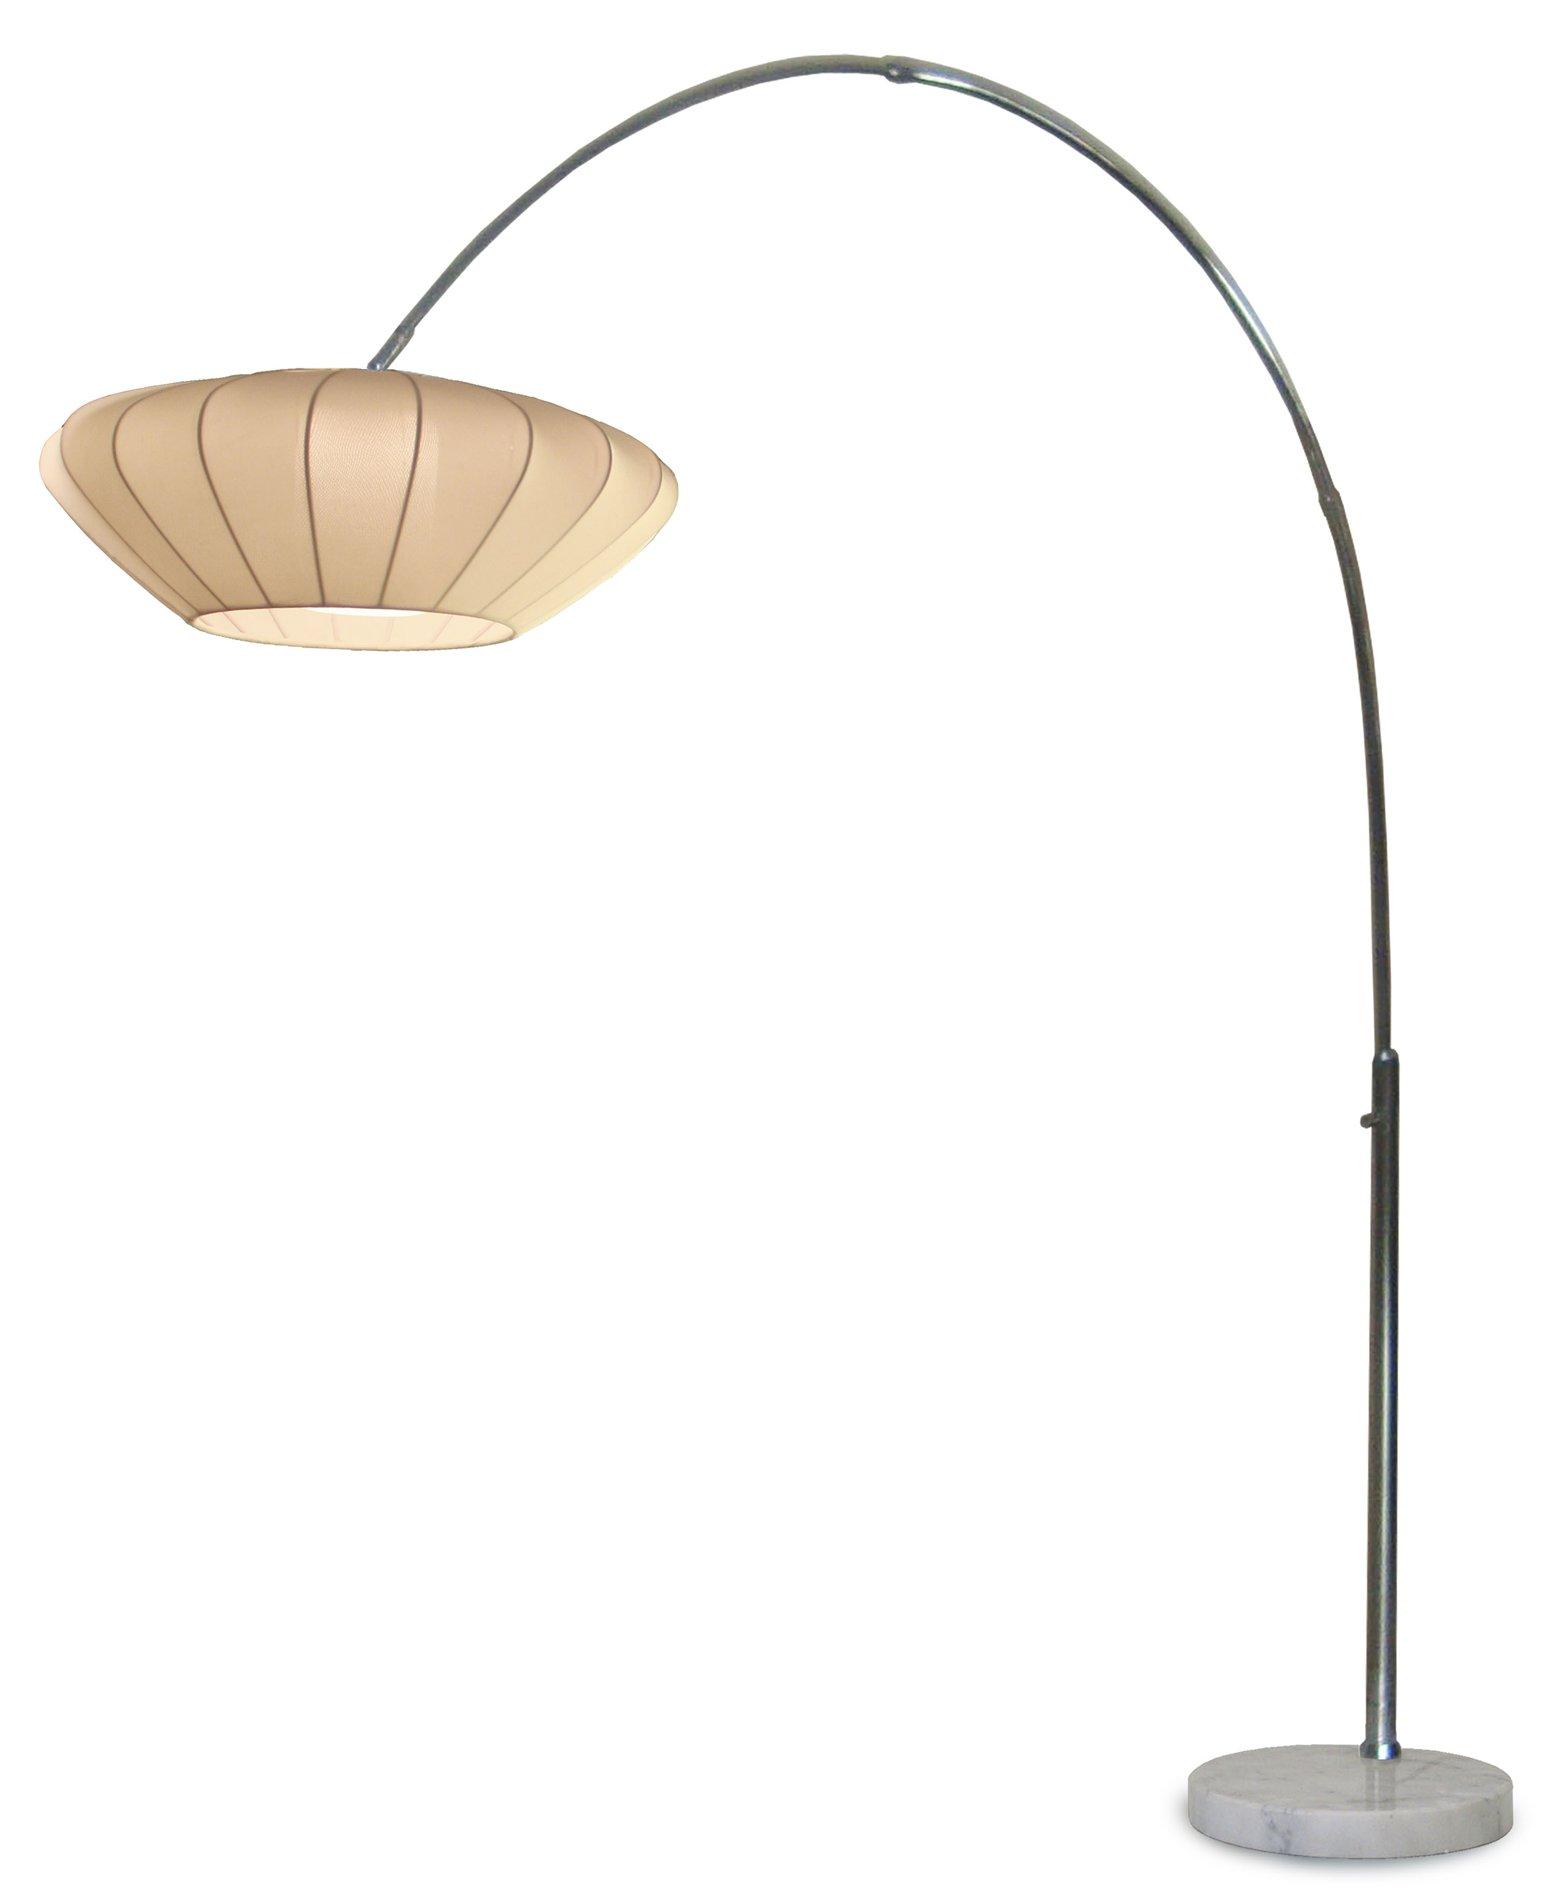 nova lighting 2110172 cloud contemporary arc floor lamp nv. Black Bedroom Furniture Sets. Home Design Ideas